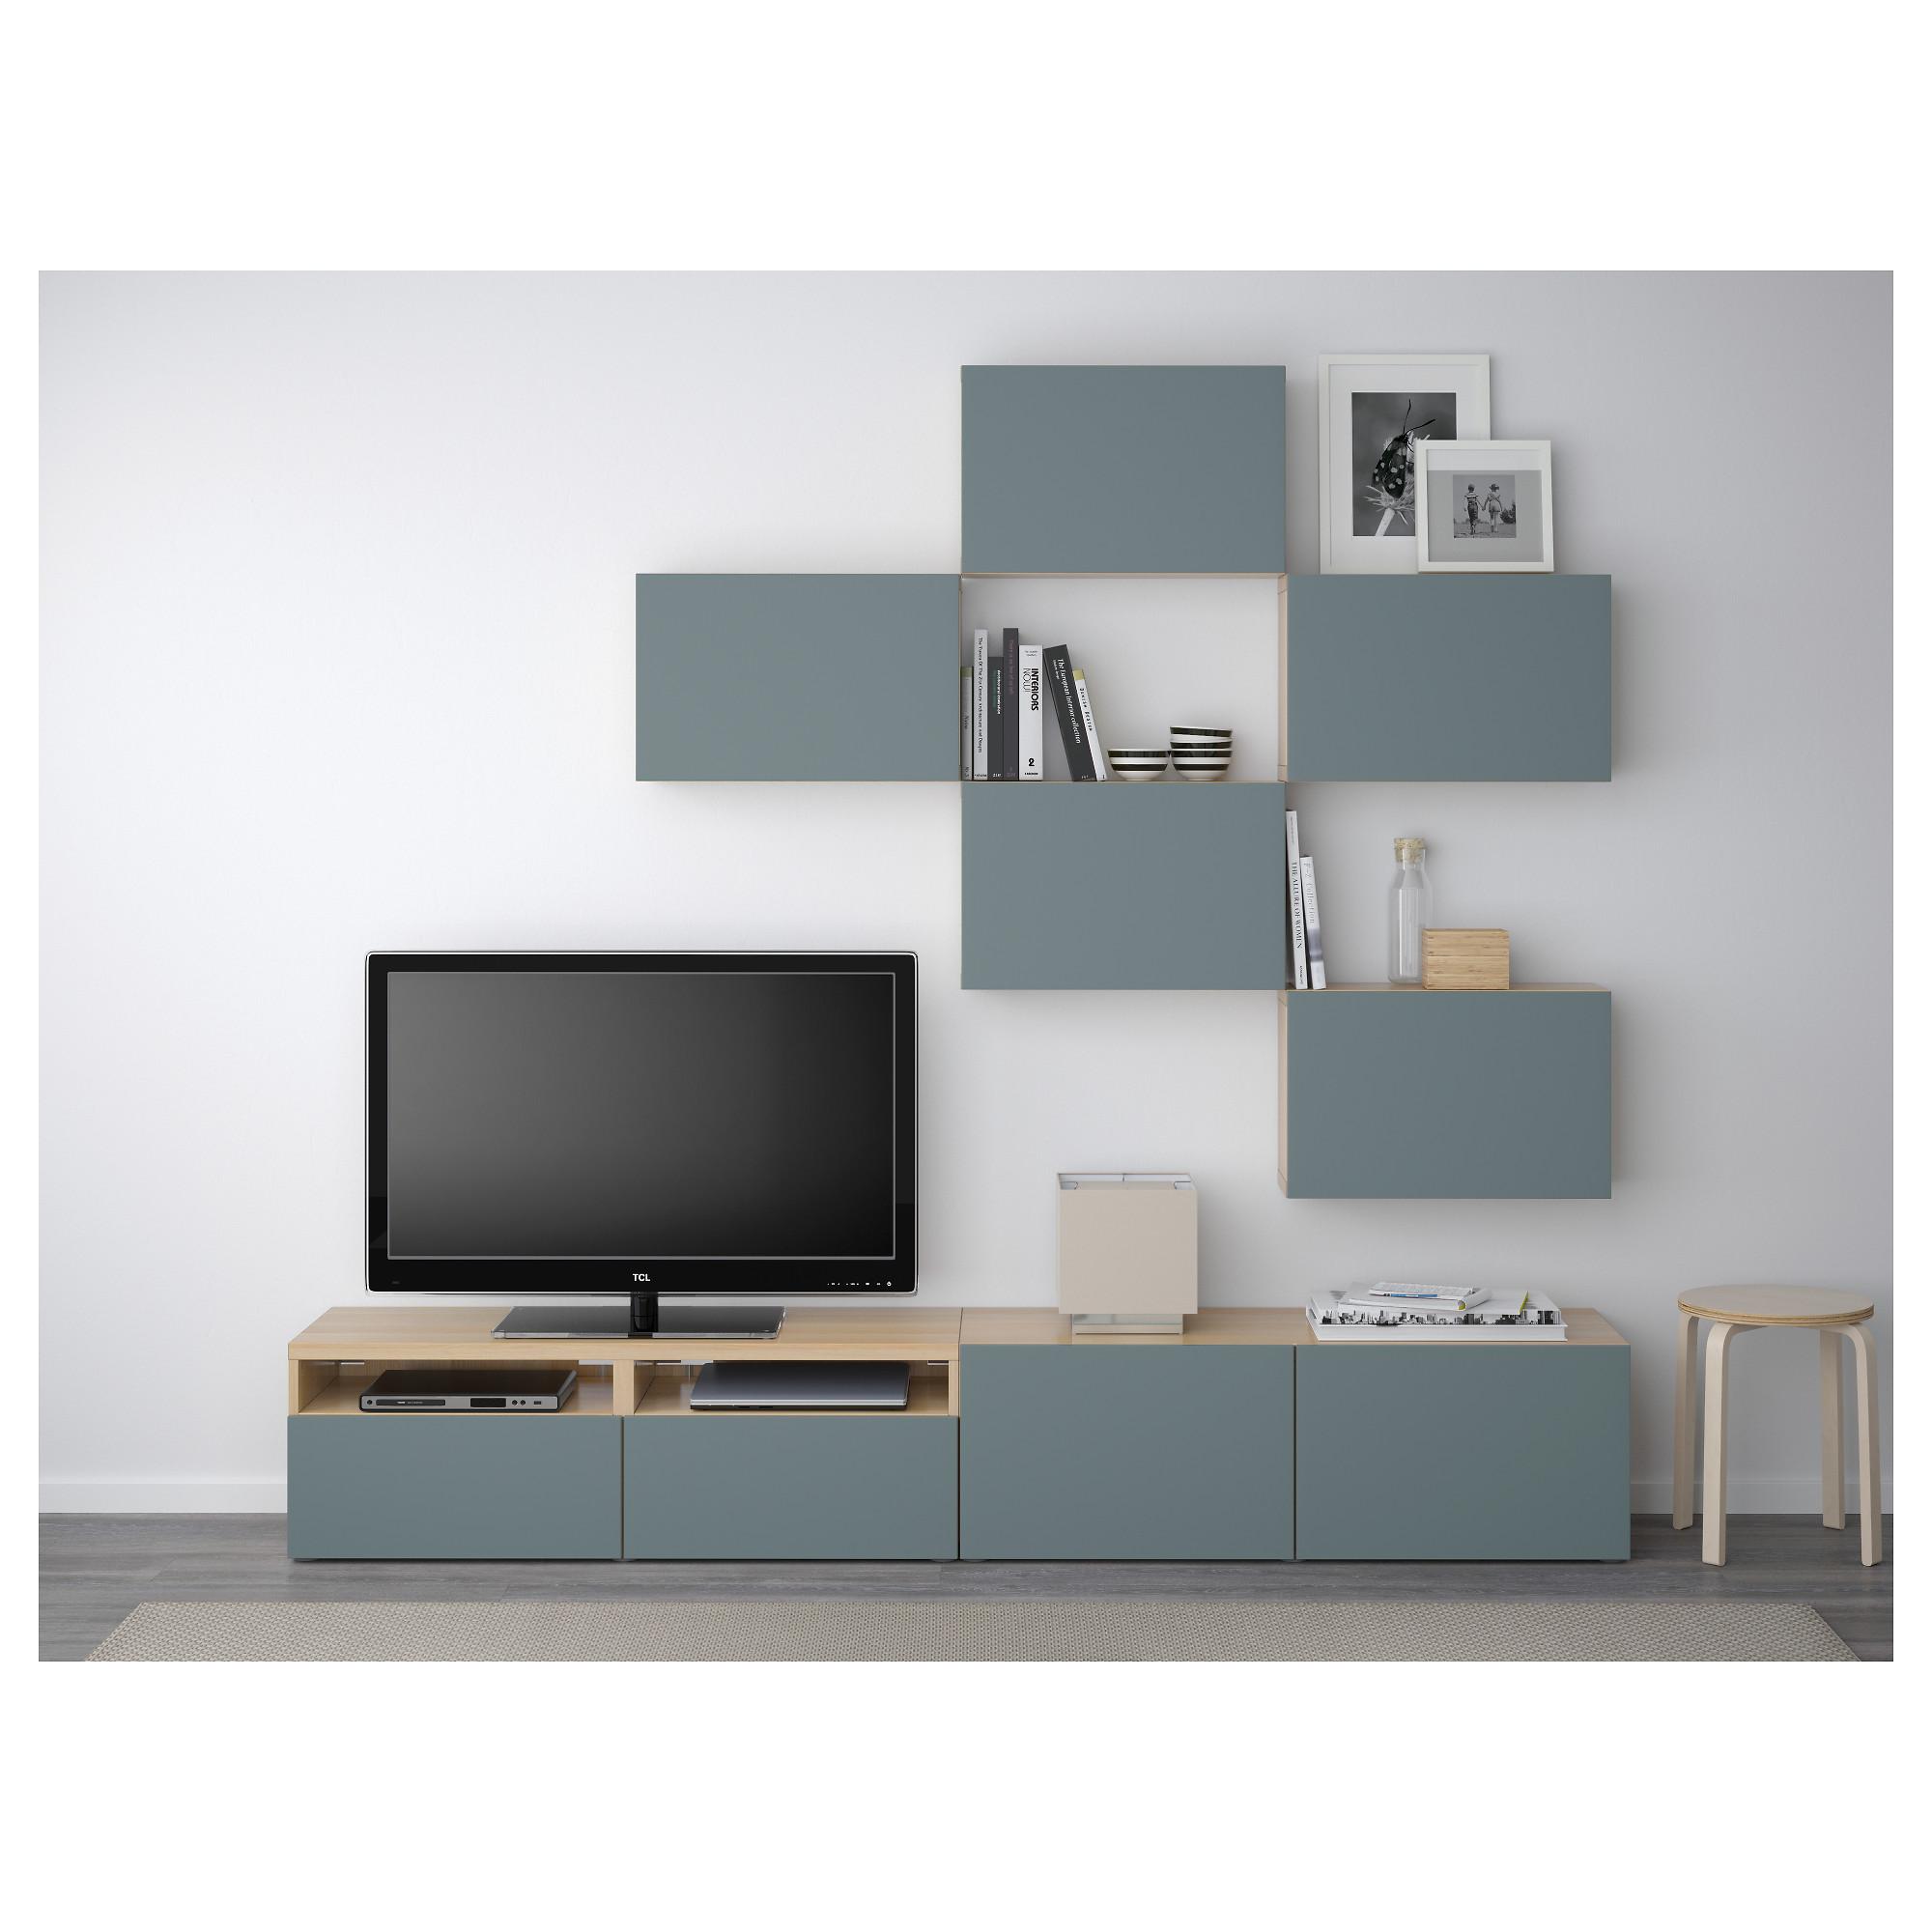 Шкаф для ТВ, комбинация БЕСТО артикуль № 792.516.70 в наличии. Онлайн магазин IKEA РБ. Недорогая доставка и установка.